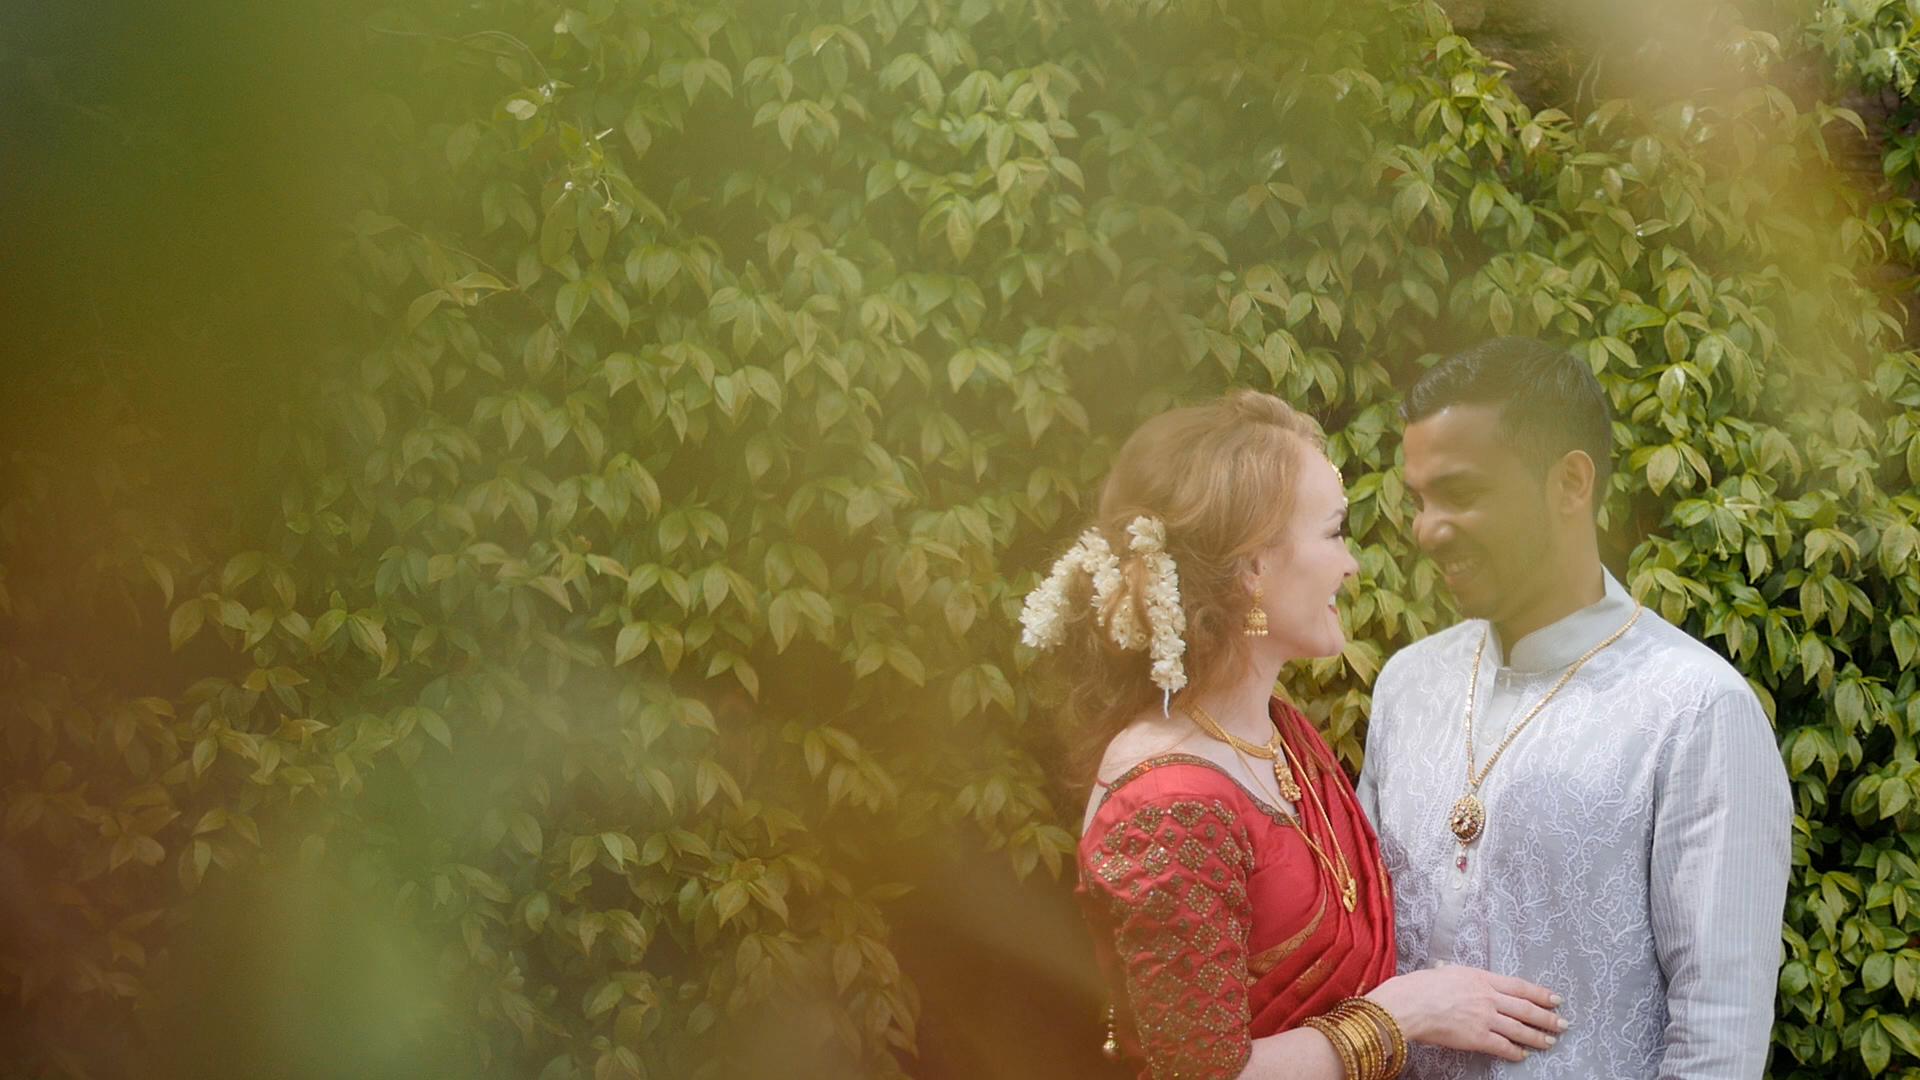 Katie & Dane - Wedding in Borgo of Tragliata